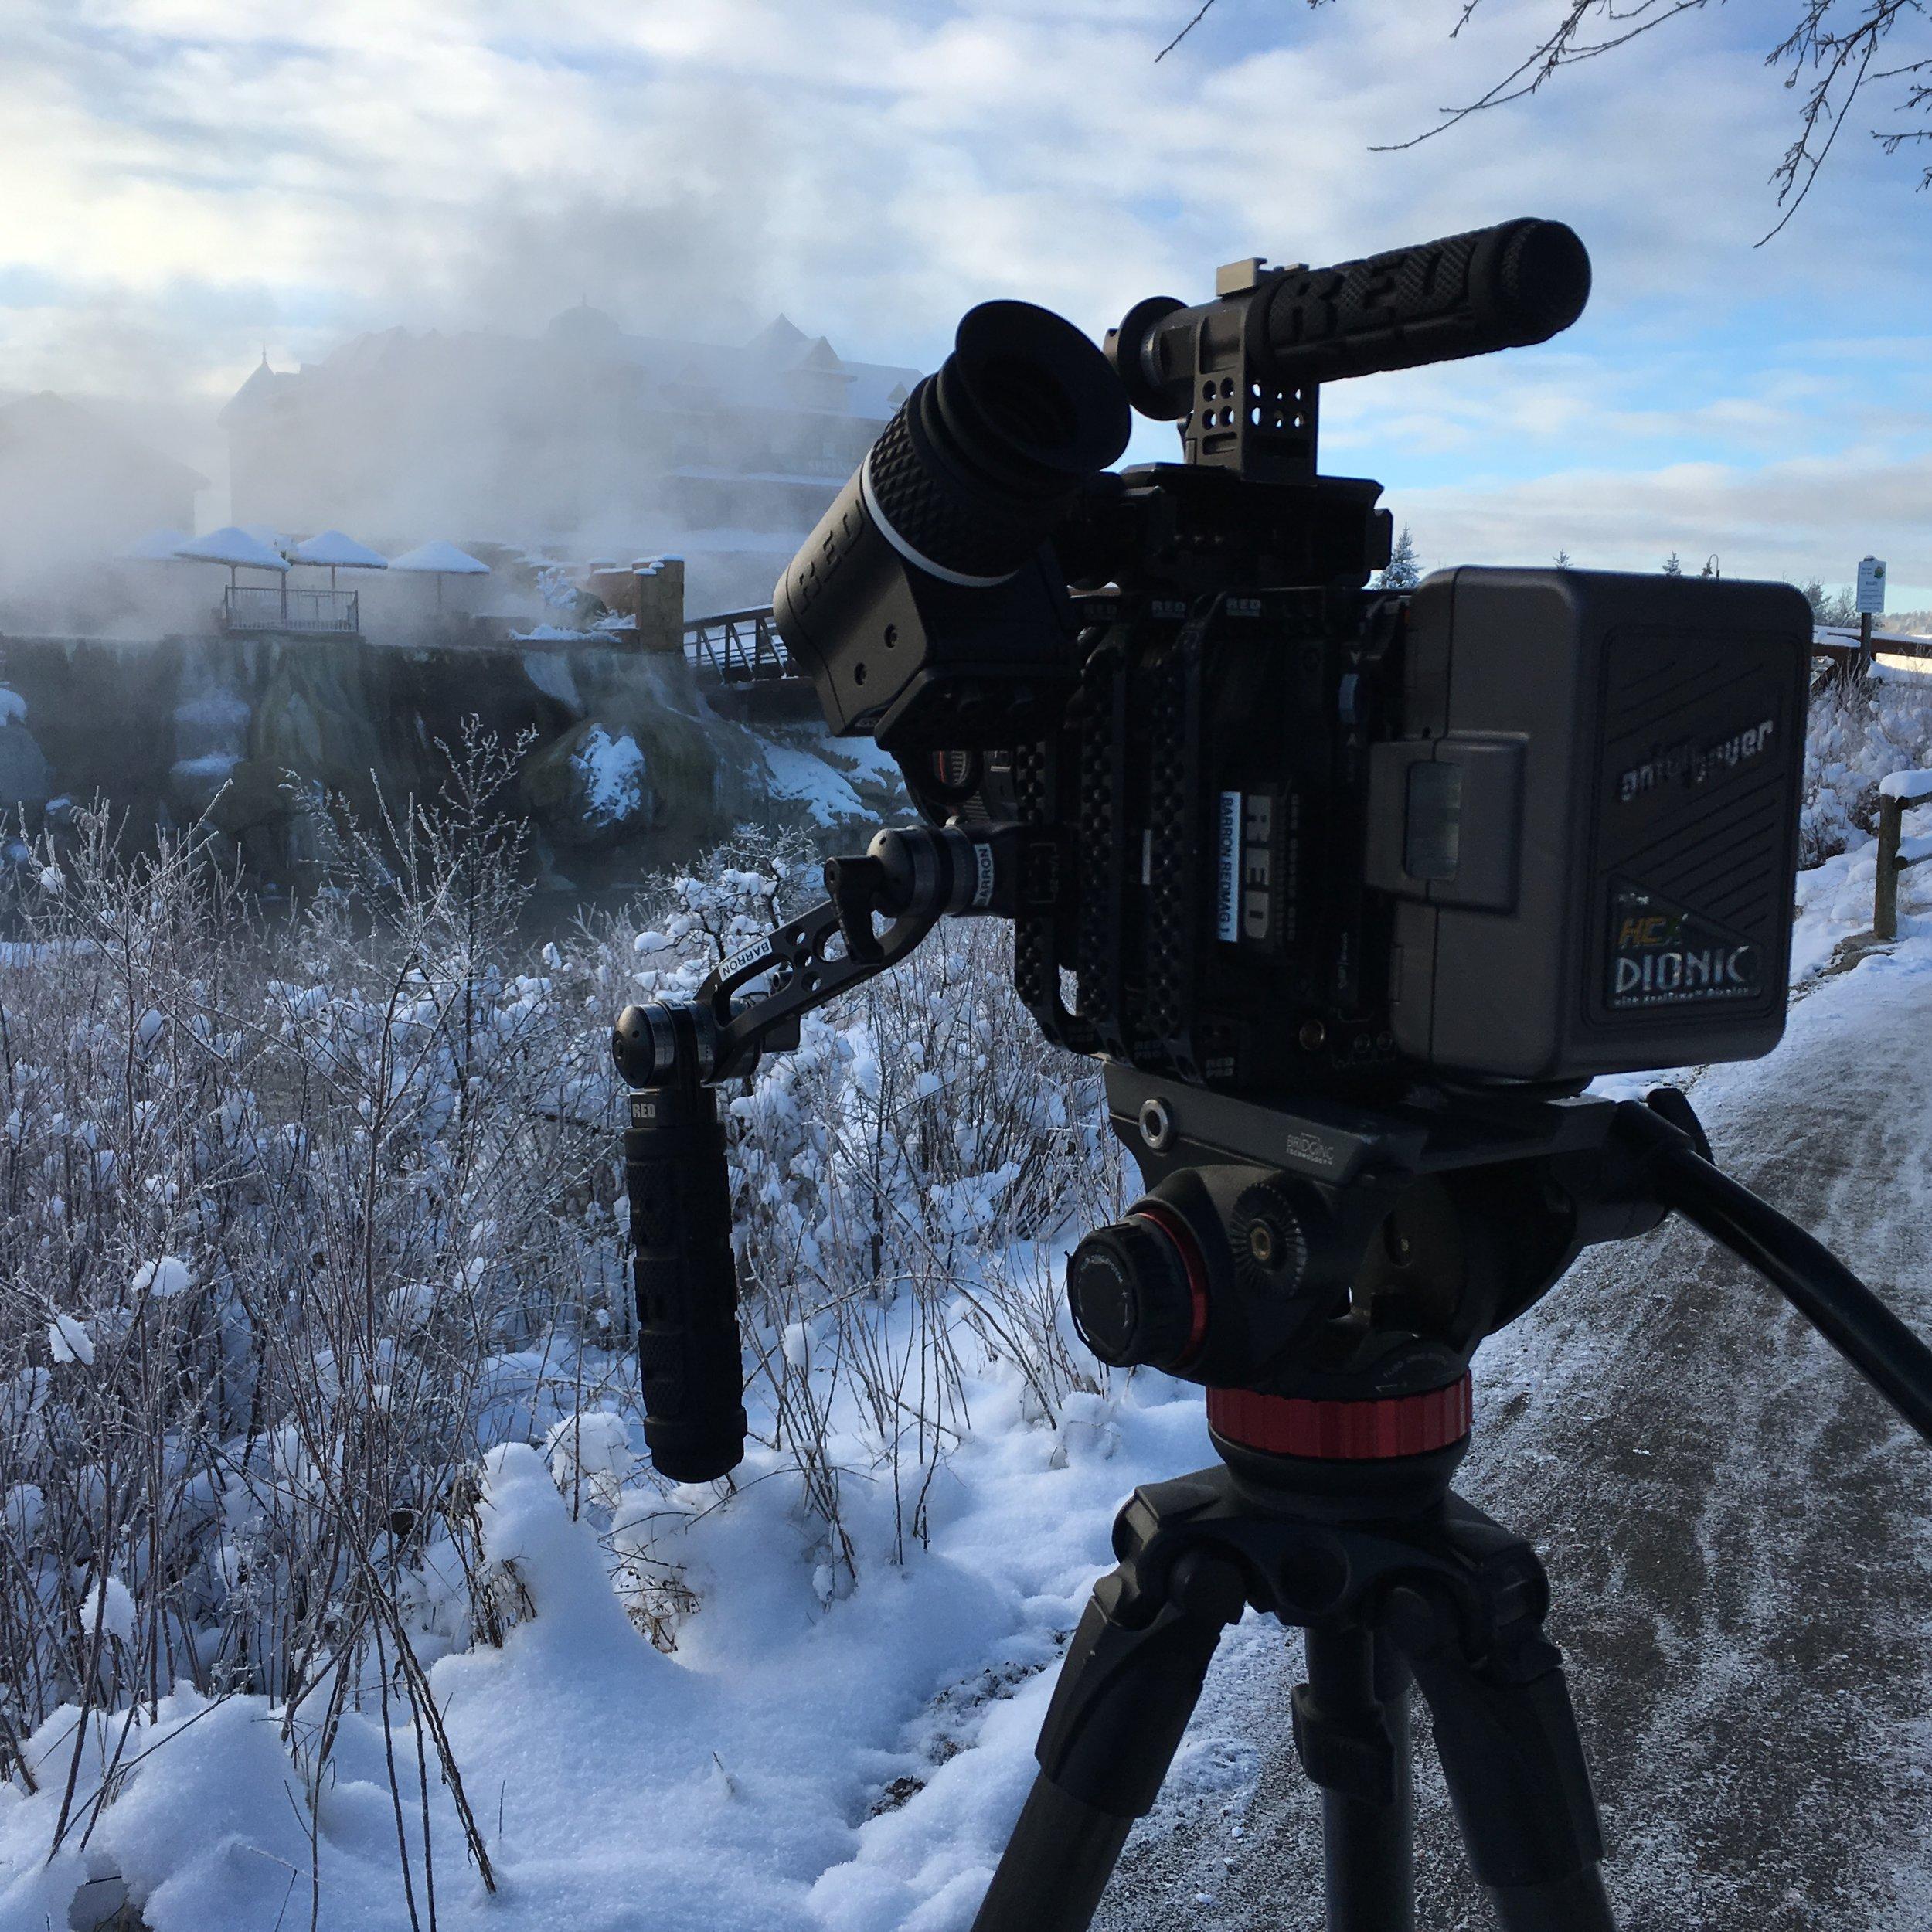 Commercial Shoot in Pagosa Springs, CO; Photo Credit: Anton Fresco